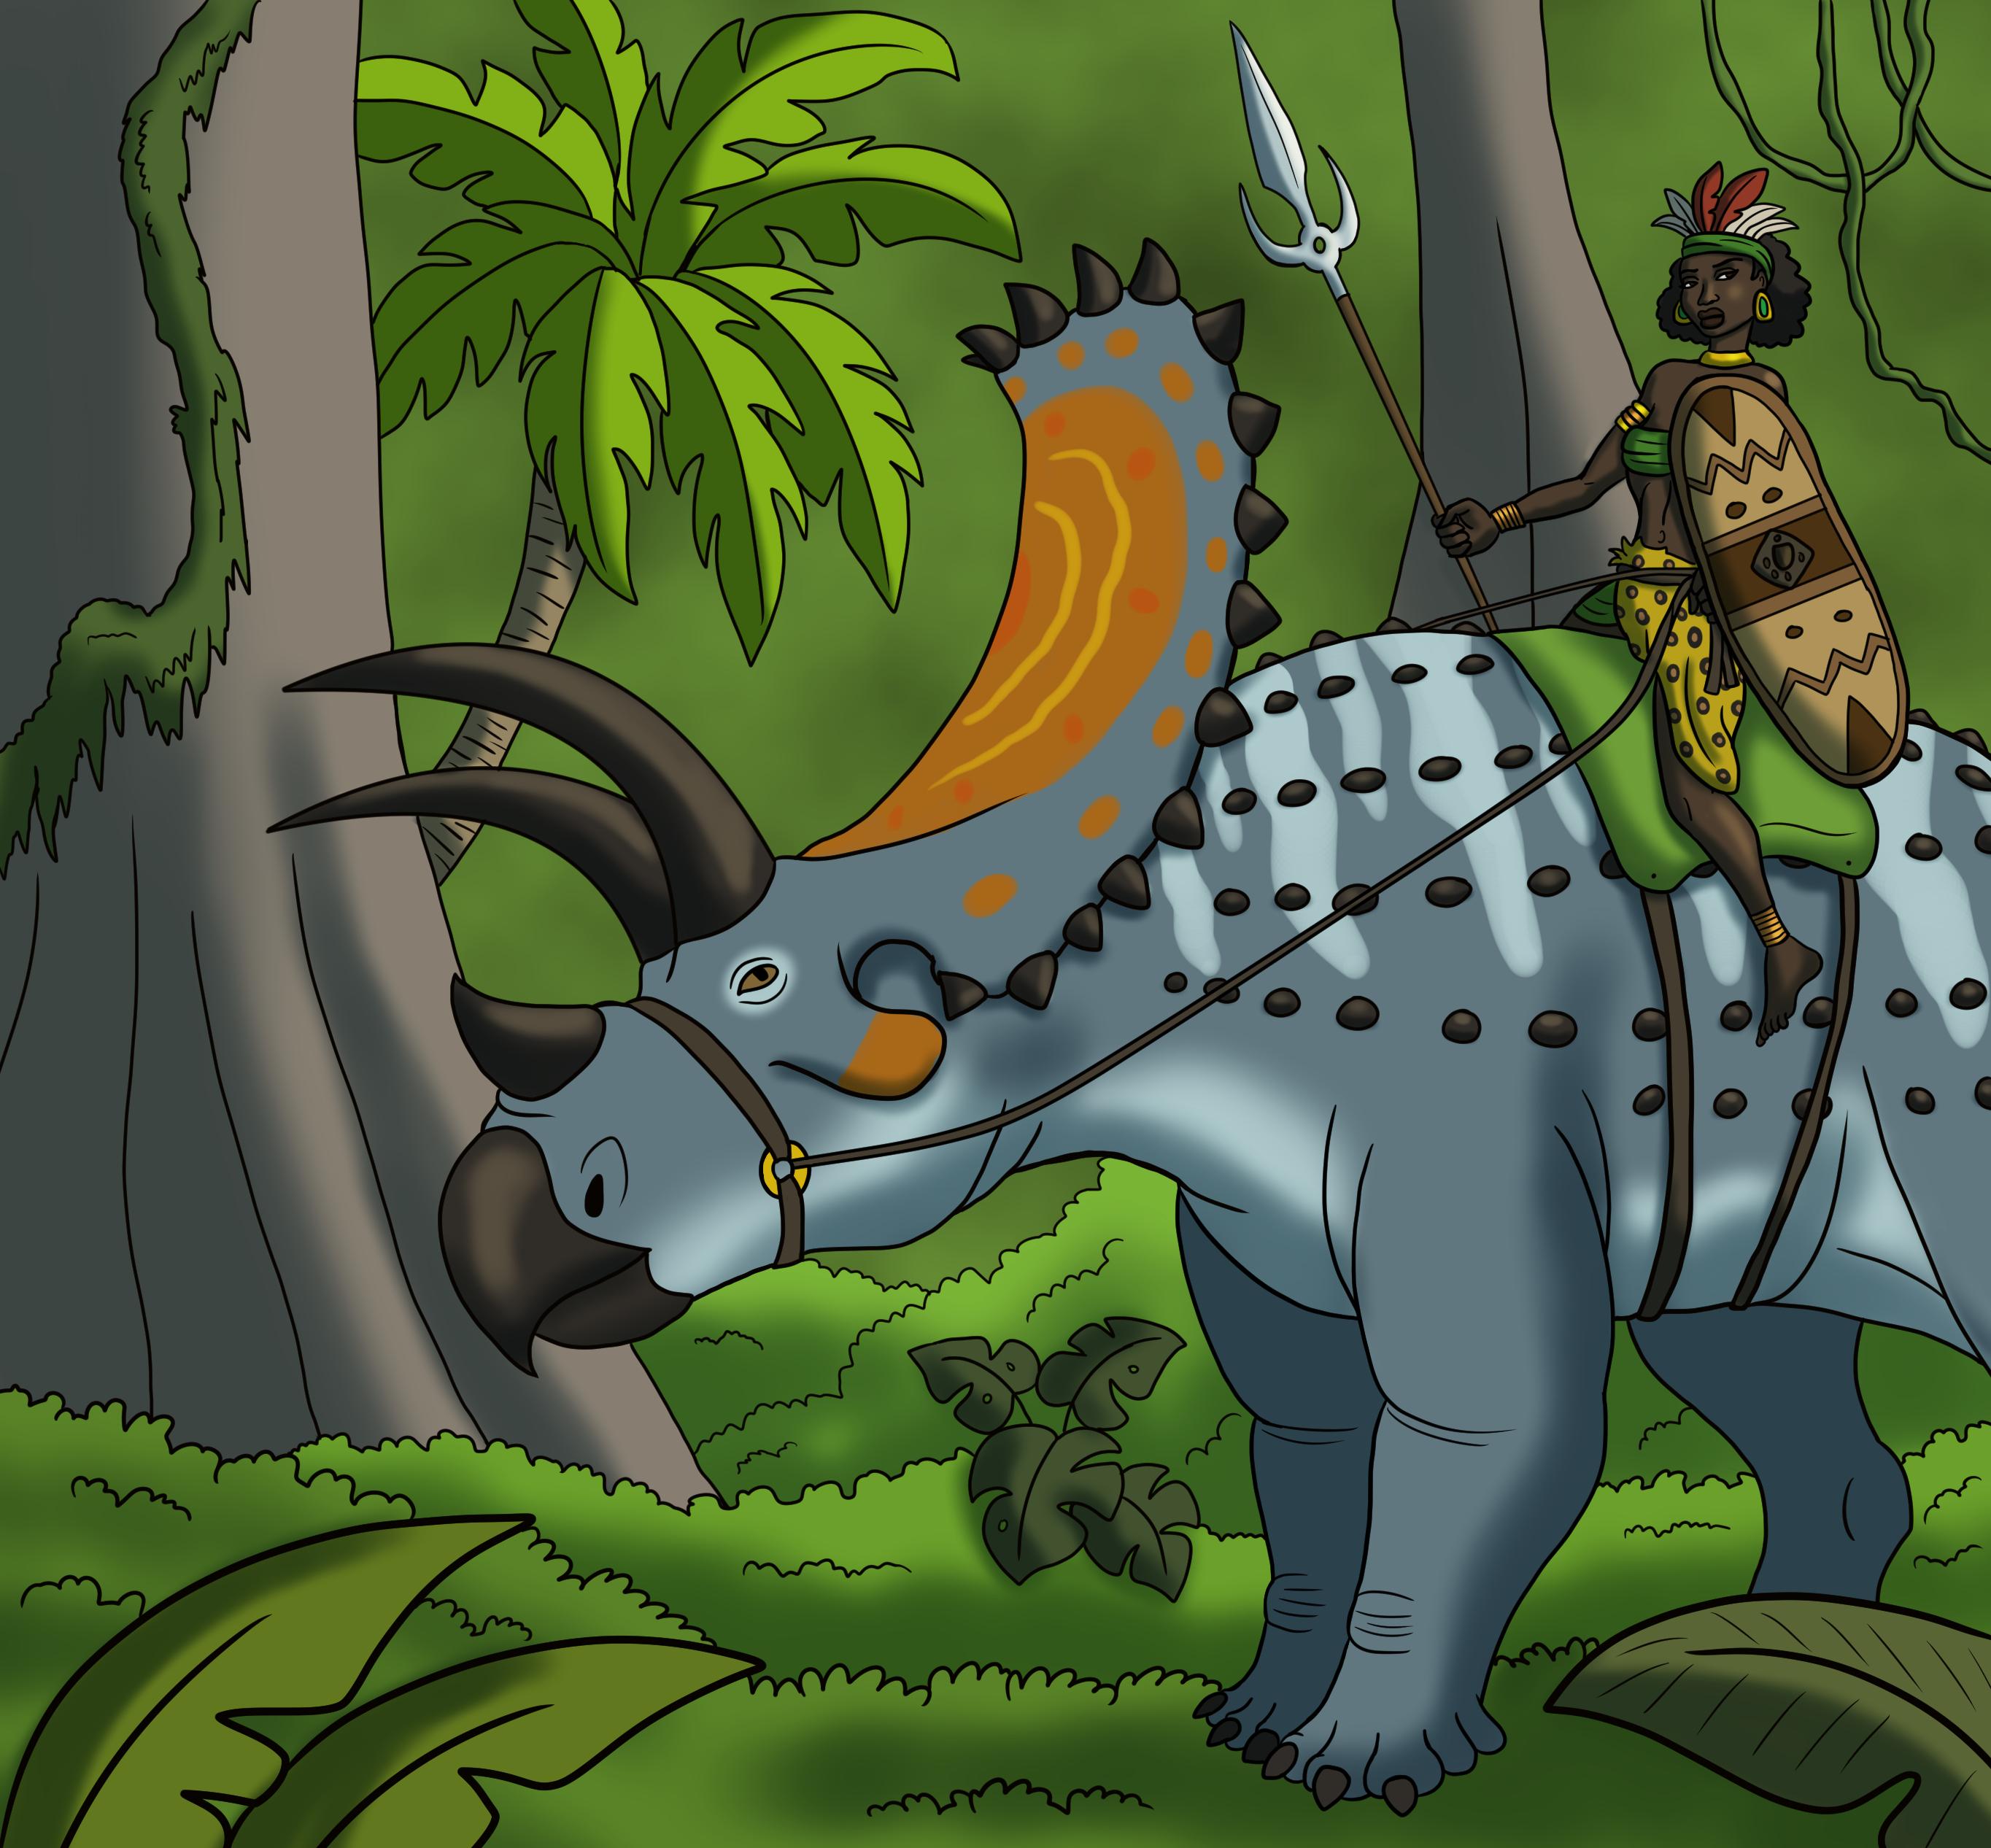 Titanoceratops Rider